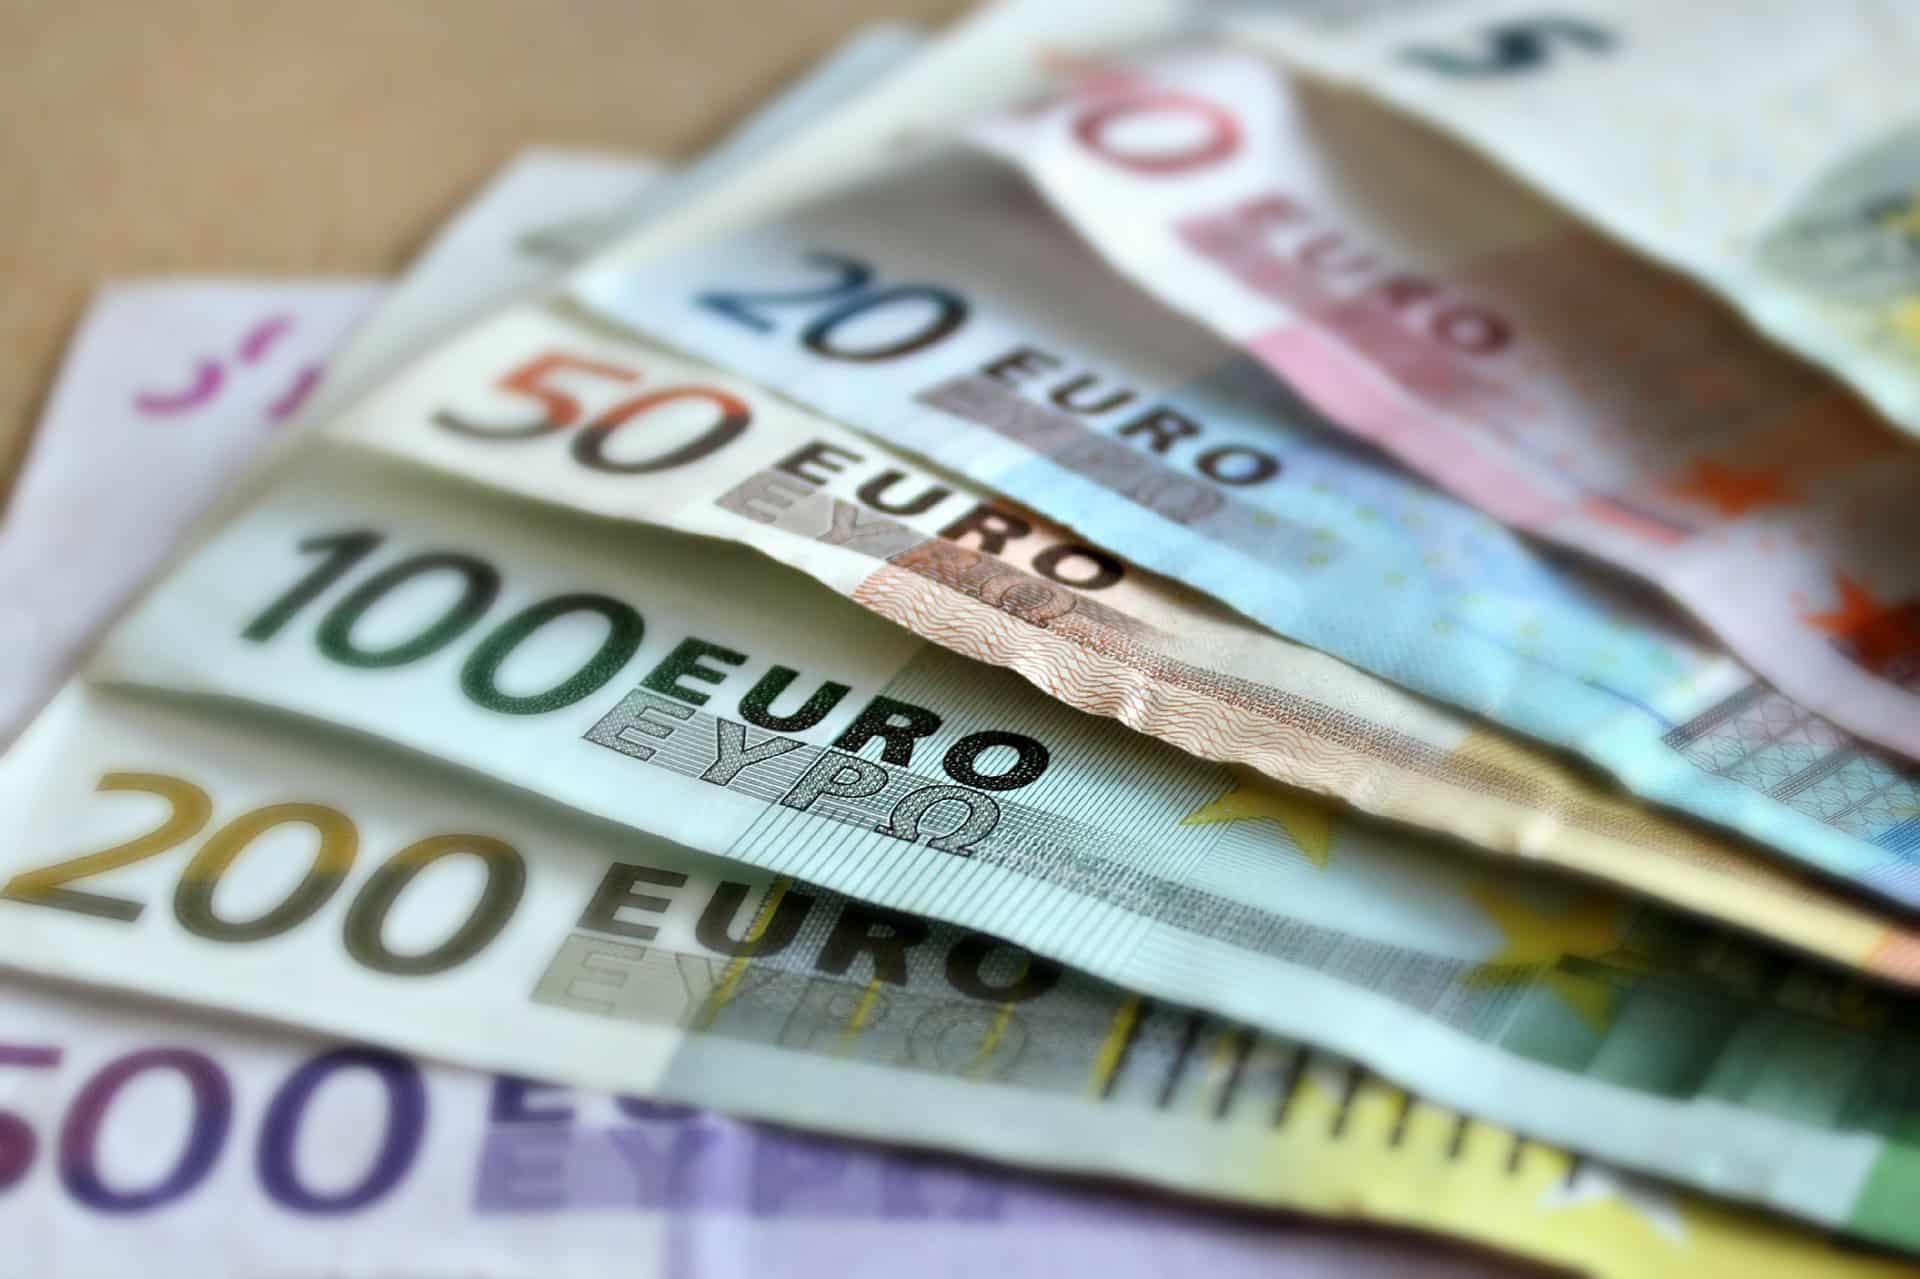 Euro Banknotes!